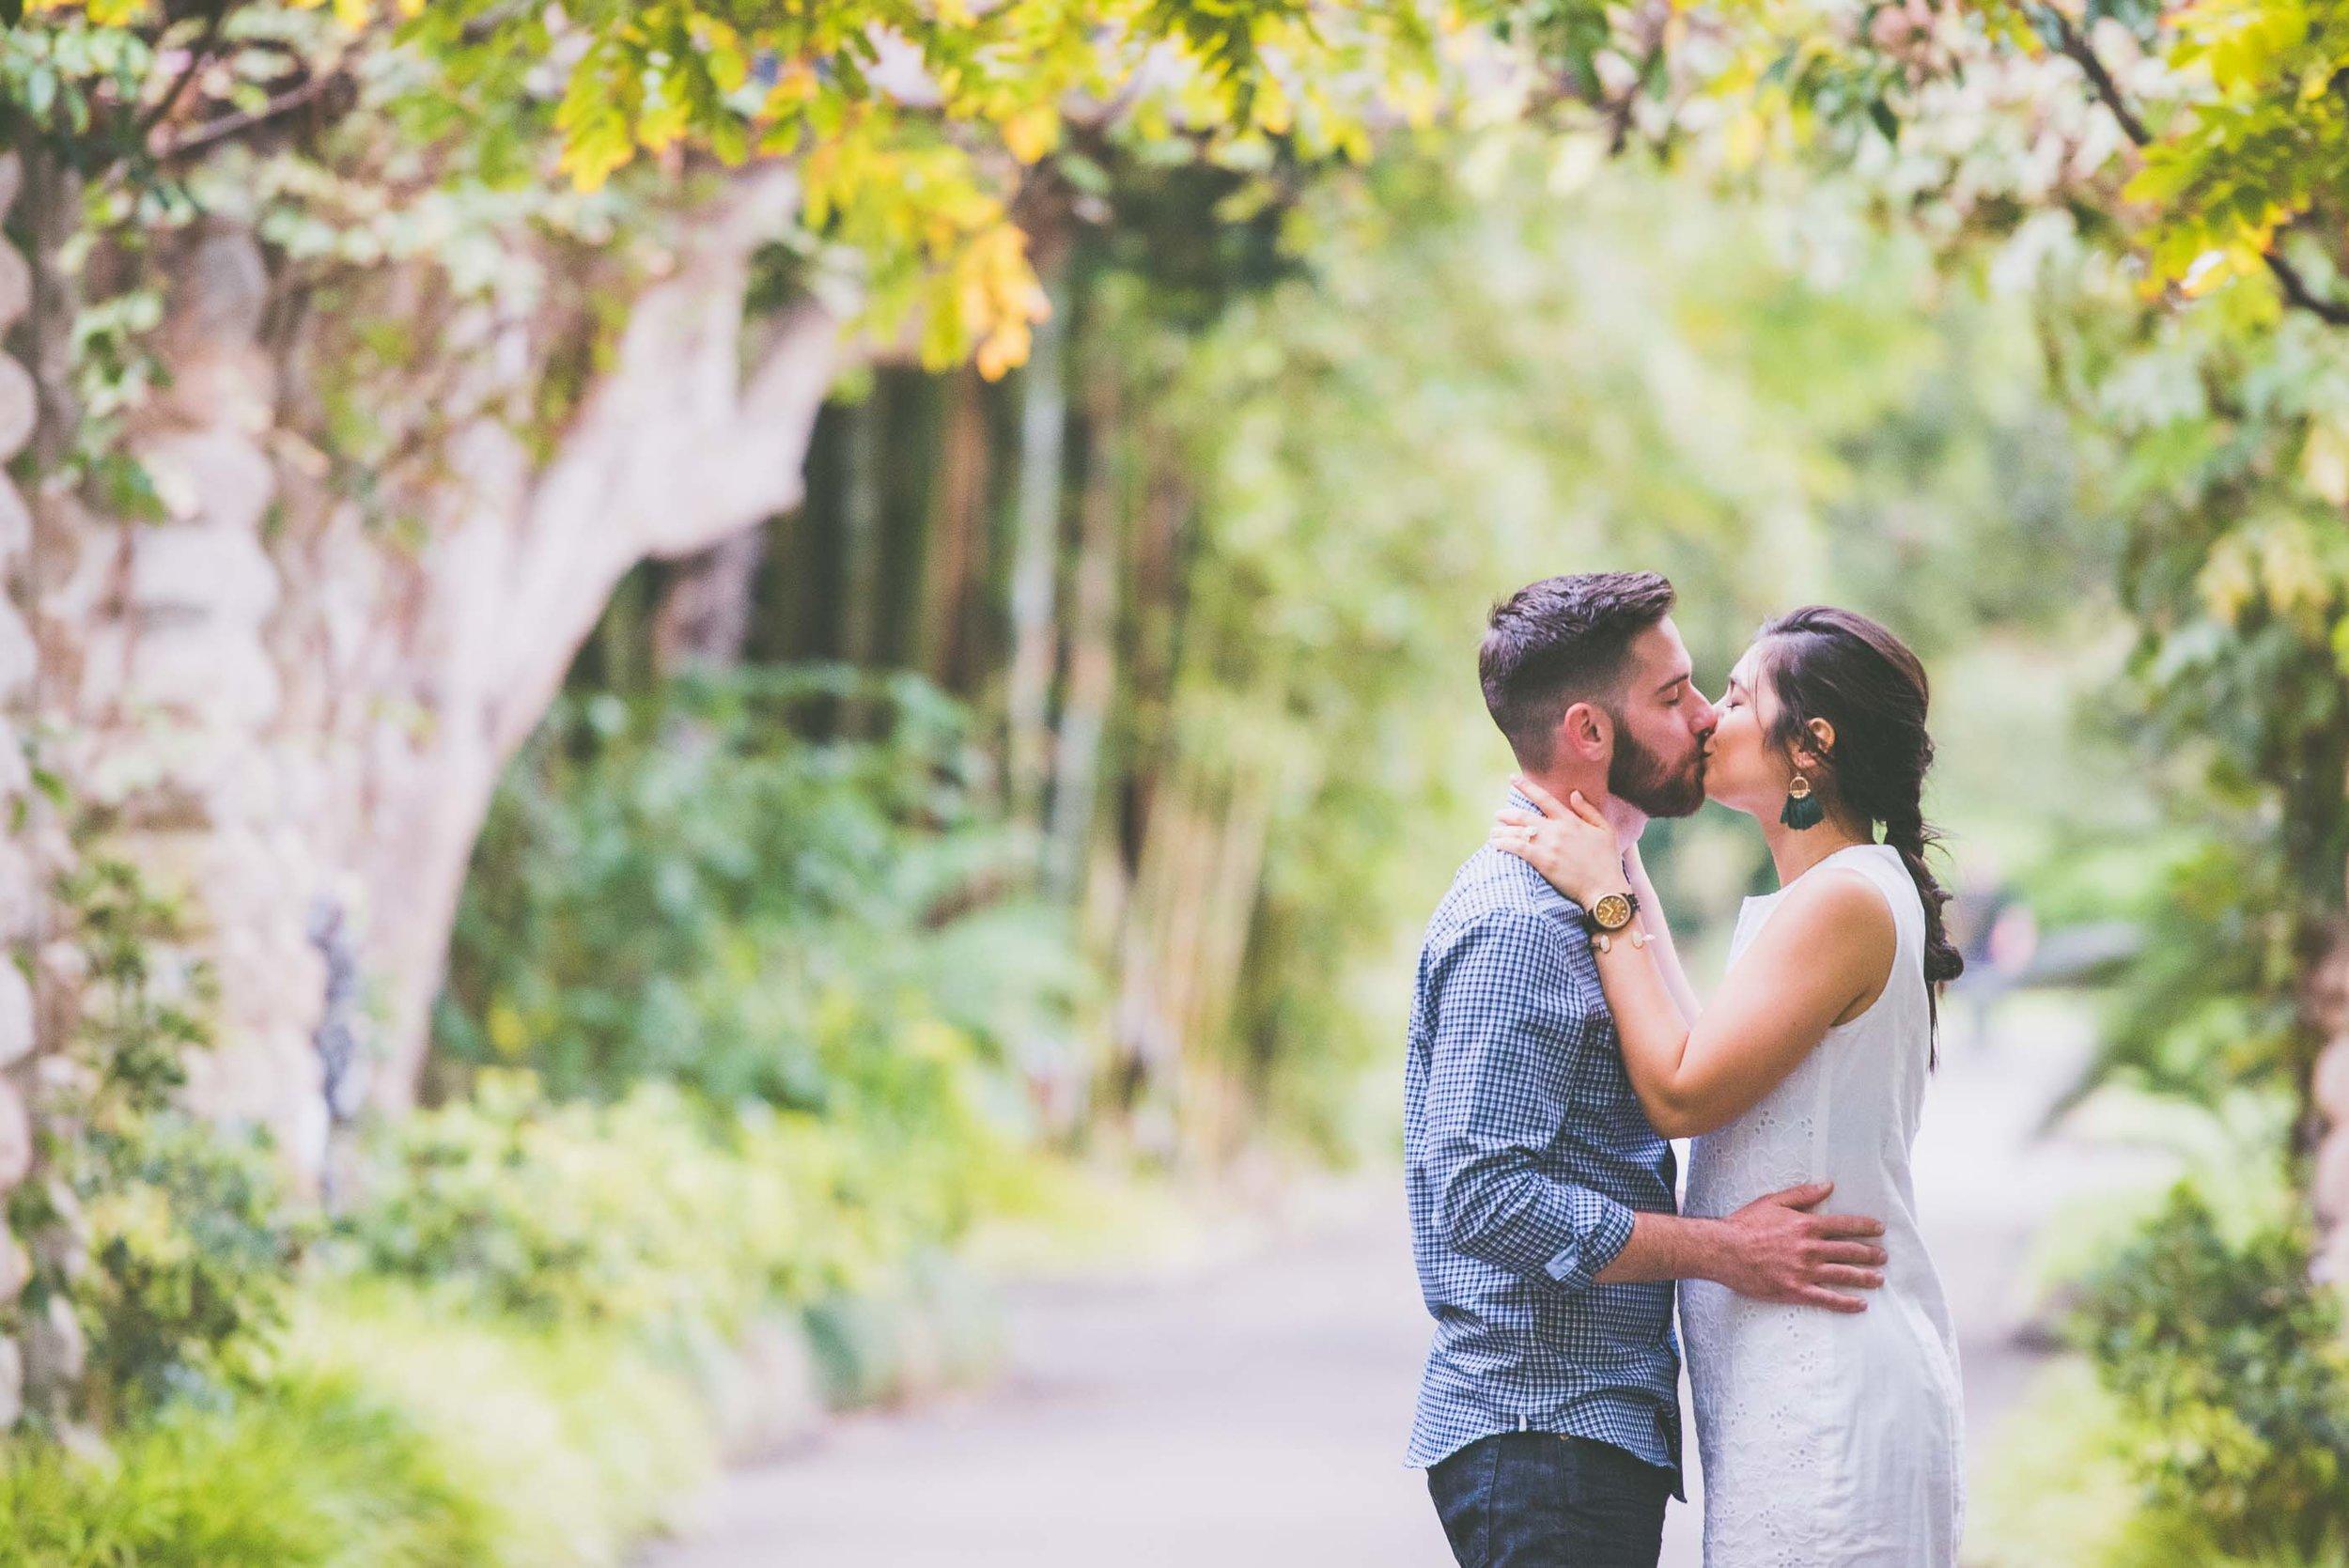 Engagement portrait - Couple kissing in Botanic Gardens Sydney - Photo credit Nicola Bailey.jpg